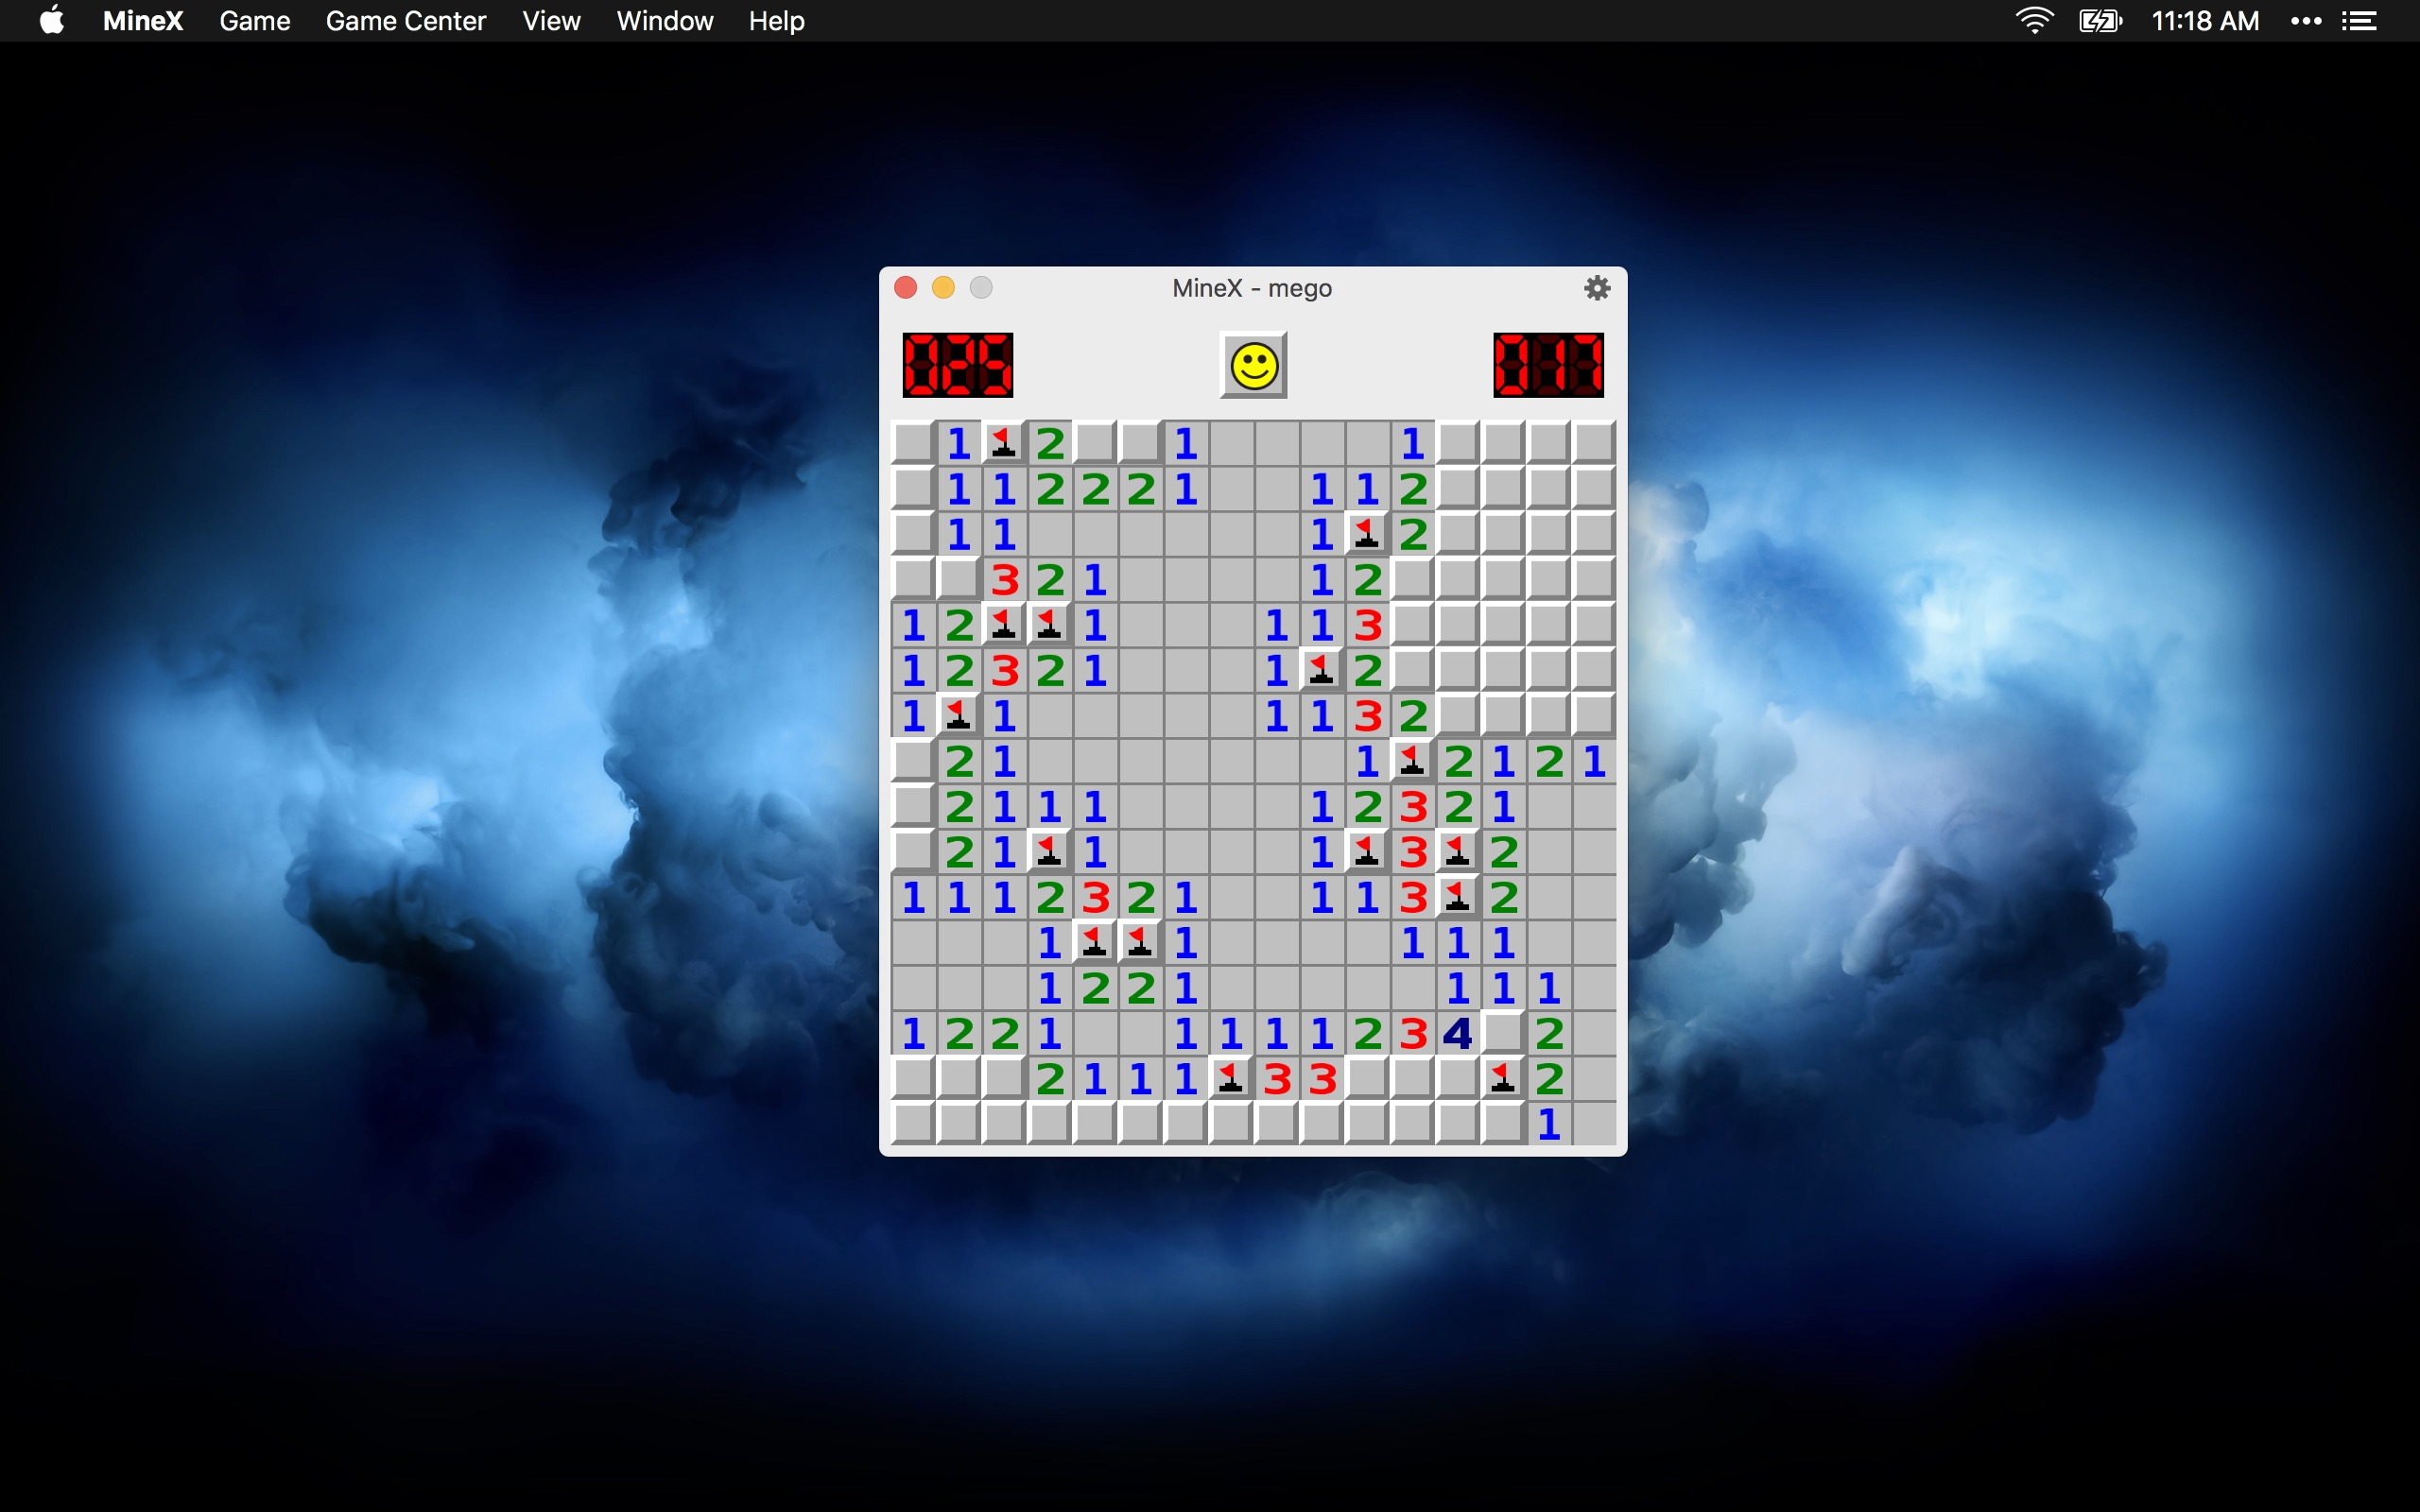 Screenshot do app MineX (Minesweeper)